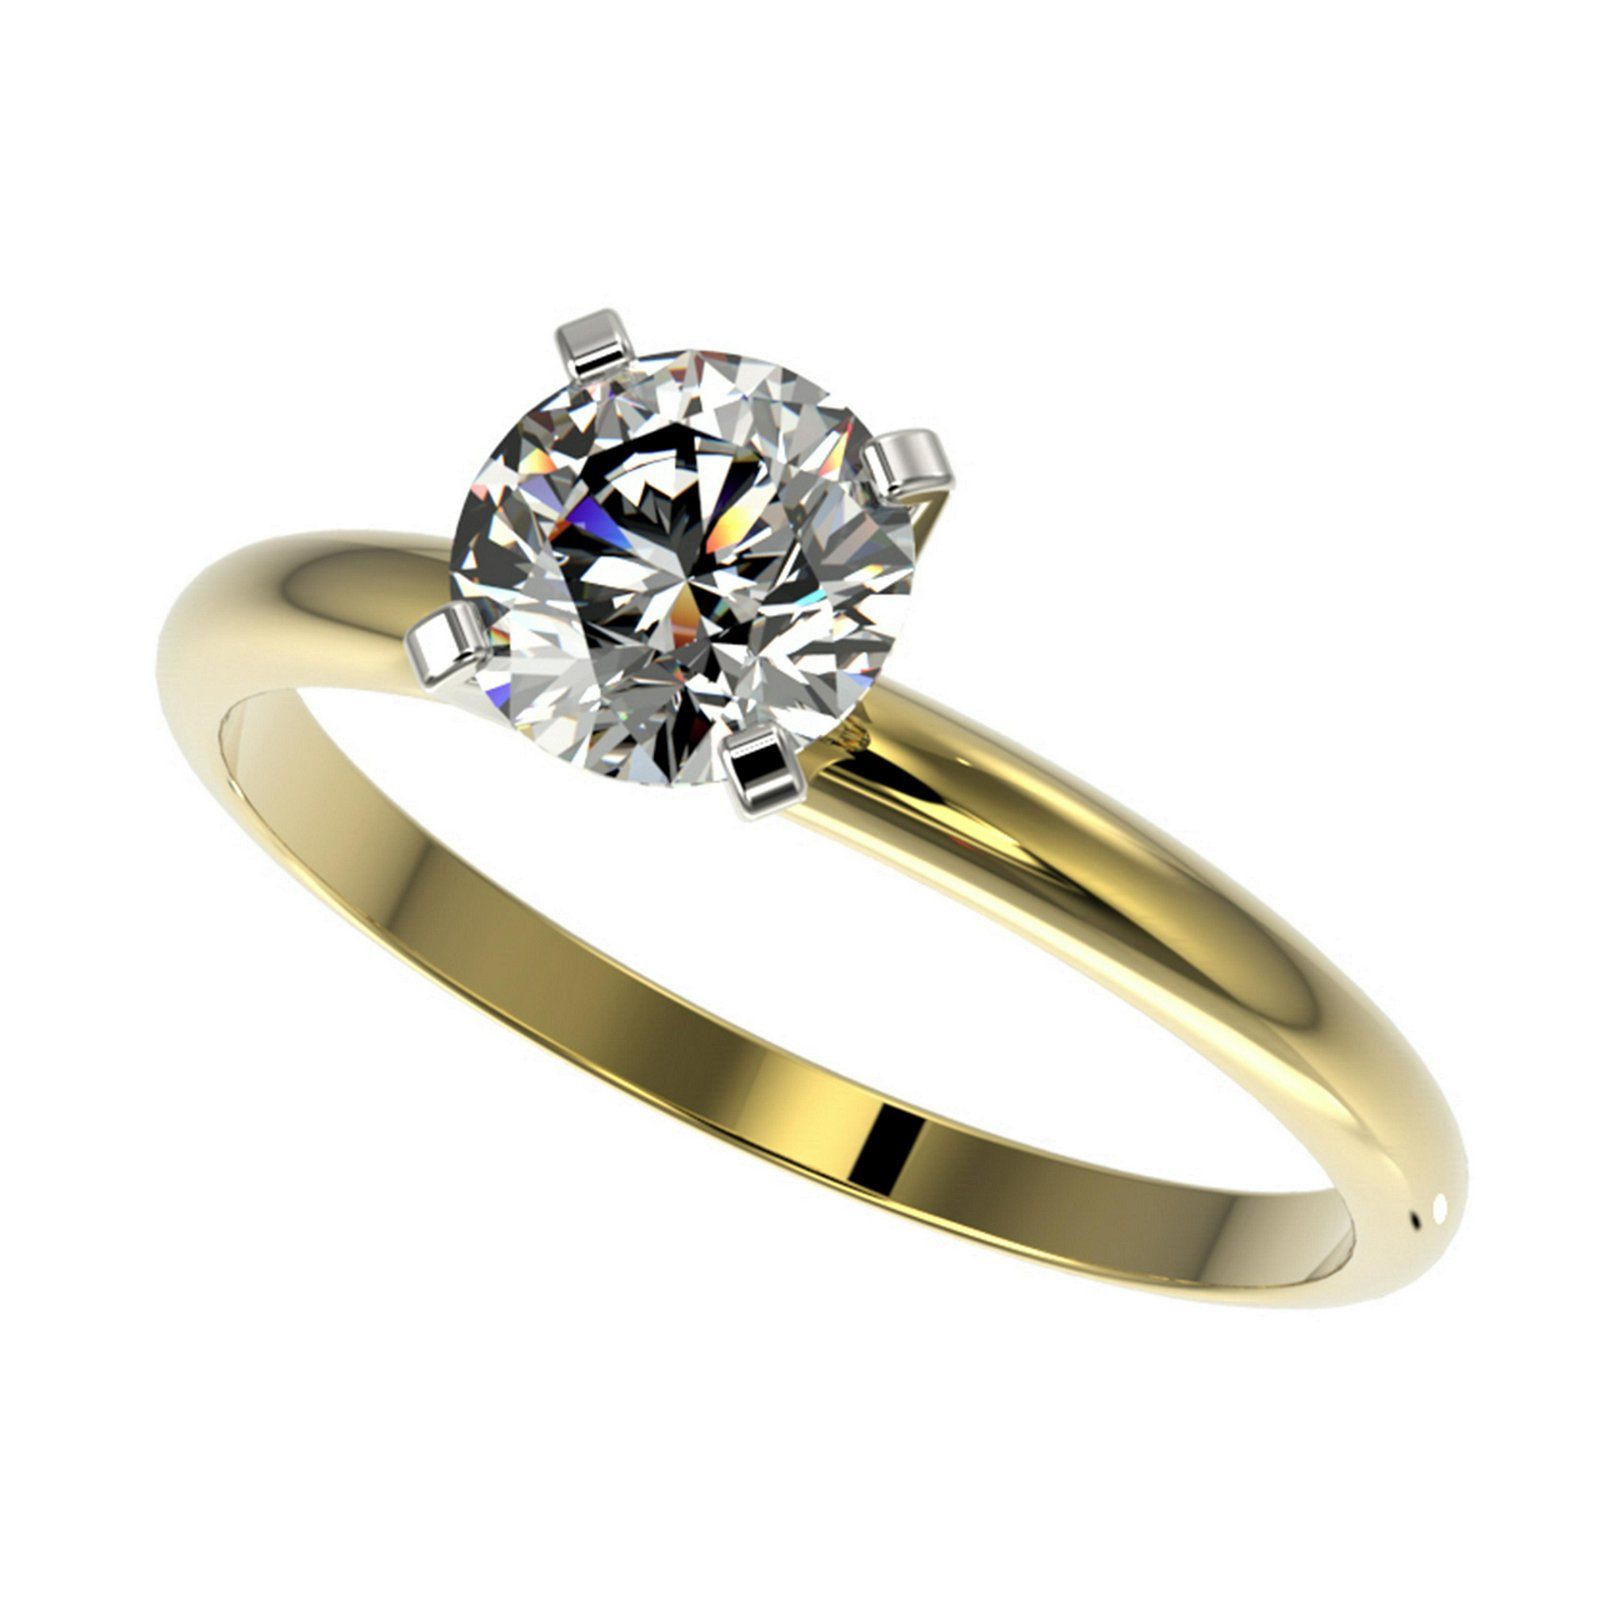 1.03 ctw H-SI/I Diamond Ring 10K Yellow Gold -